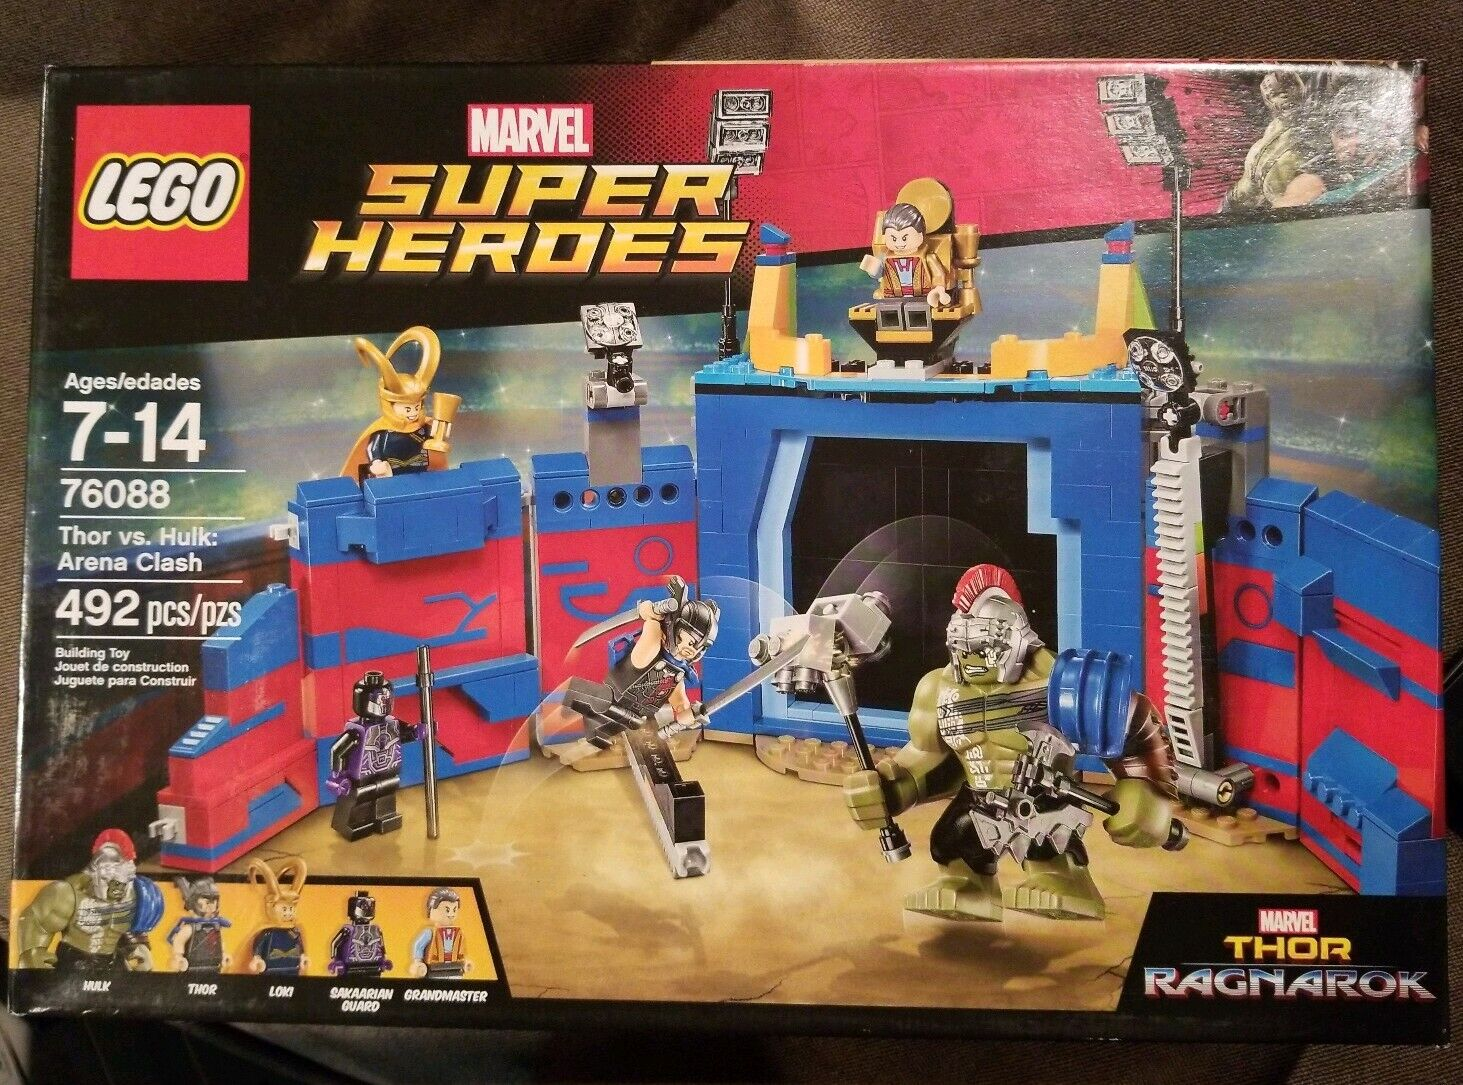 LEGO Marvel Super Heroes Thor vs. Hulk Arena  Clash 2017 (76088)  shopping online di moda